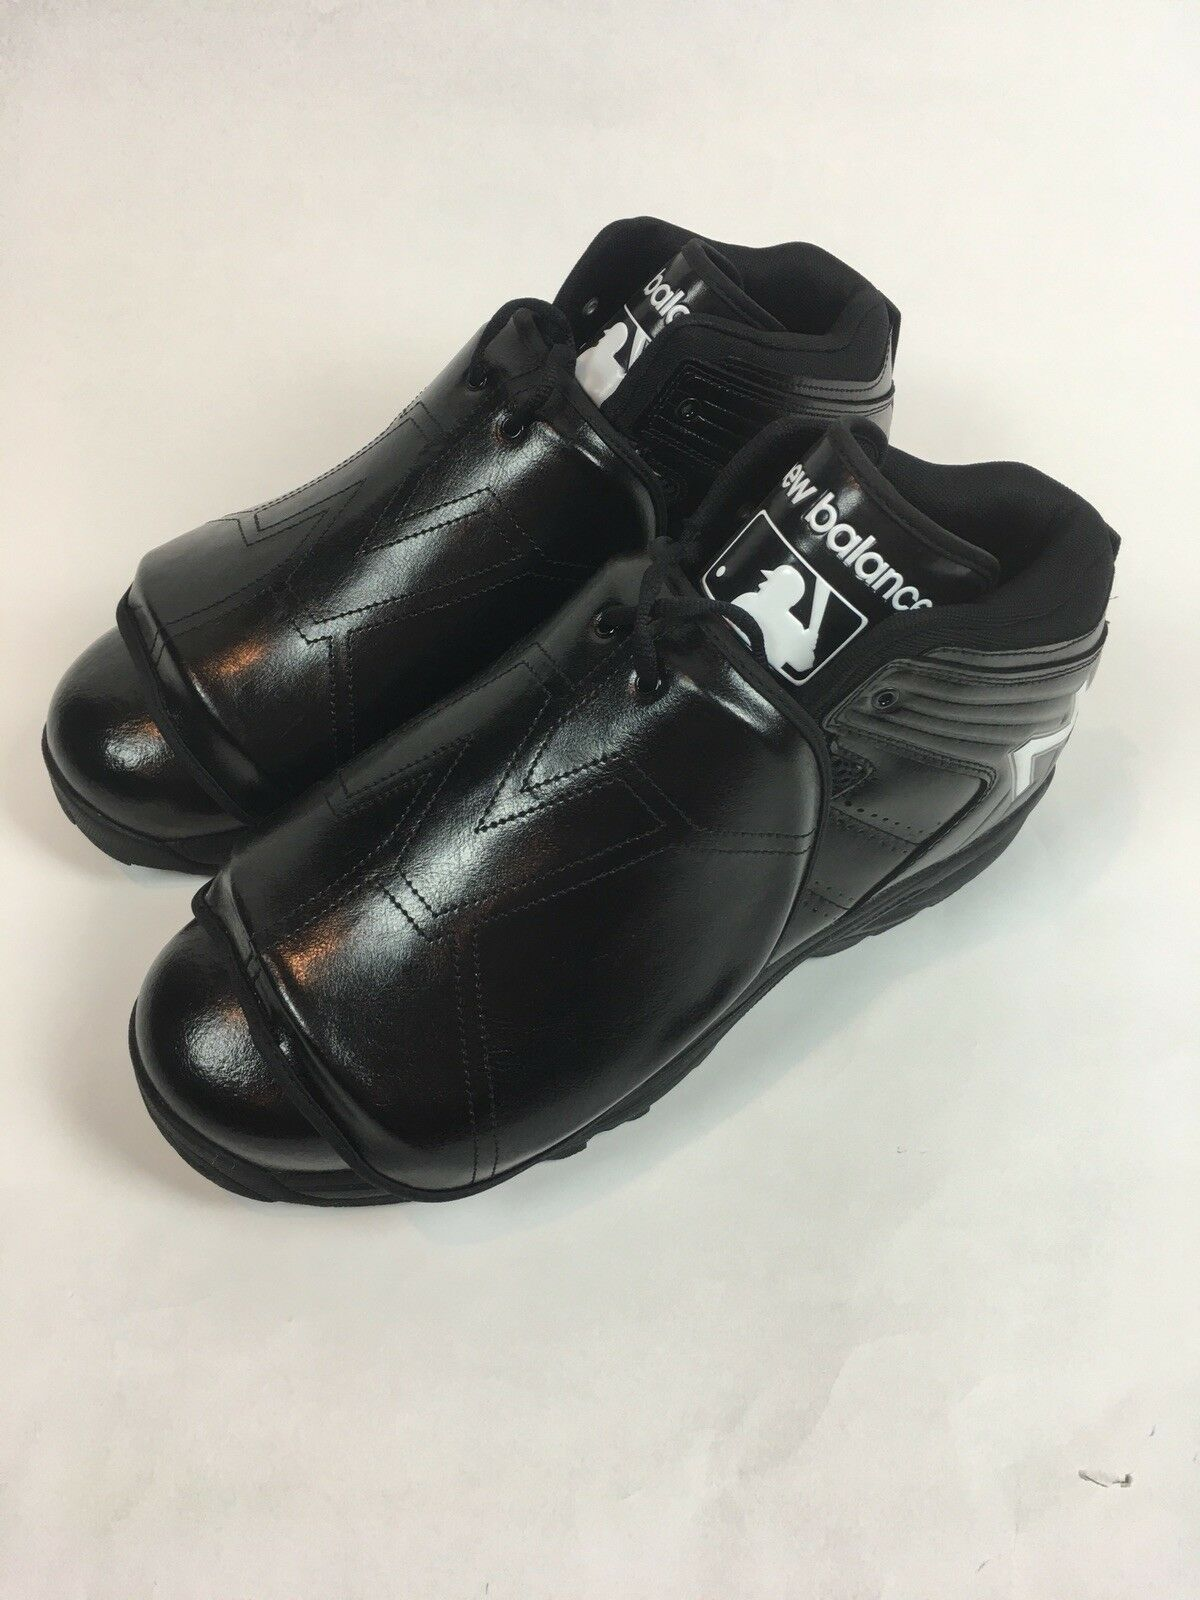 Men's New Balance Baseball - Softball Umpire Predective Plate shoes - 15 - New